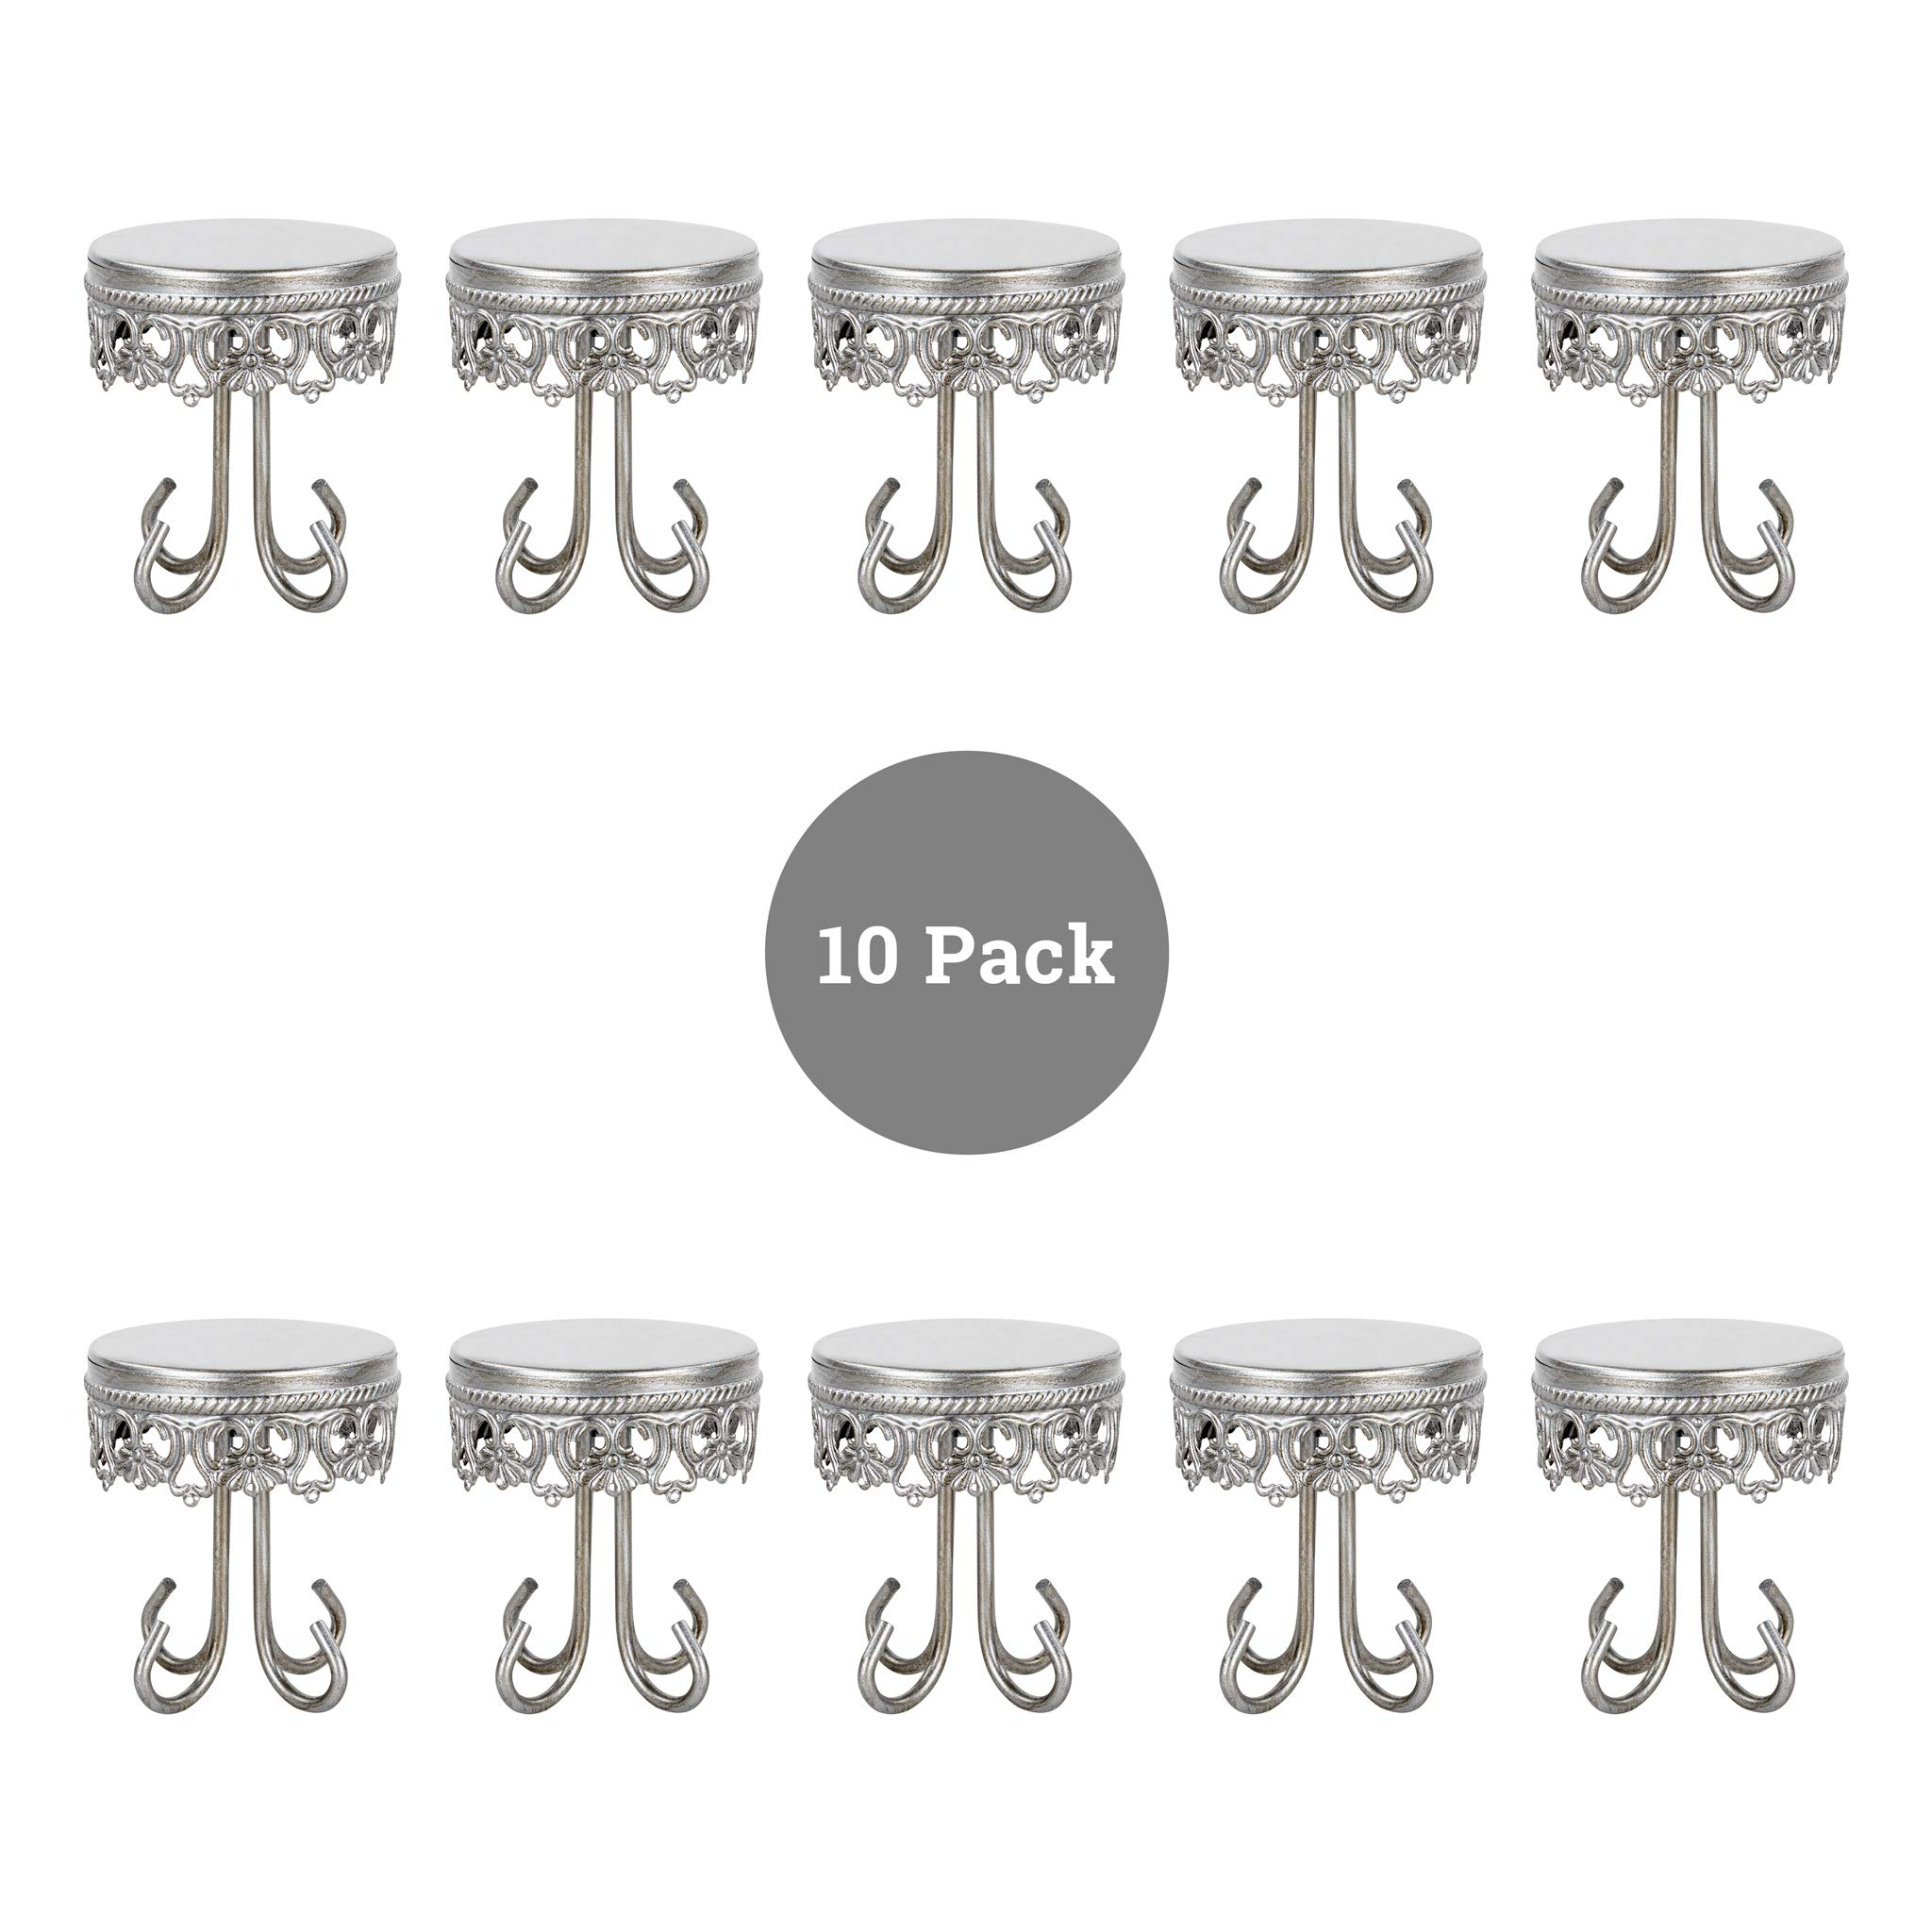 10 Piece Mini 3.5'' Cupcake Holder Set (Silver)